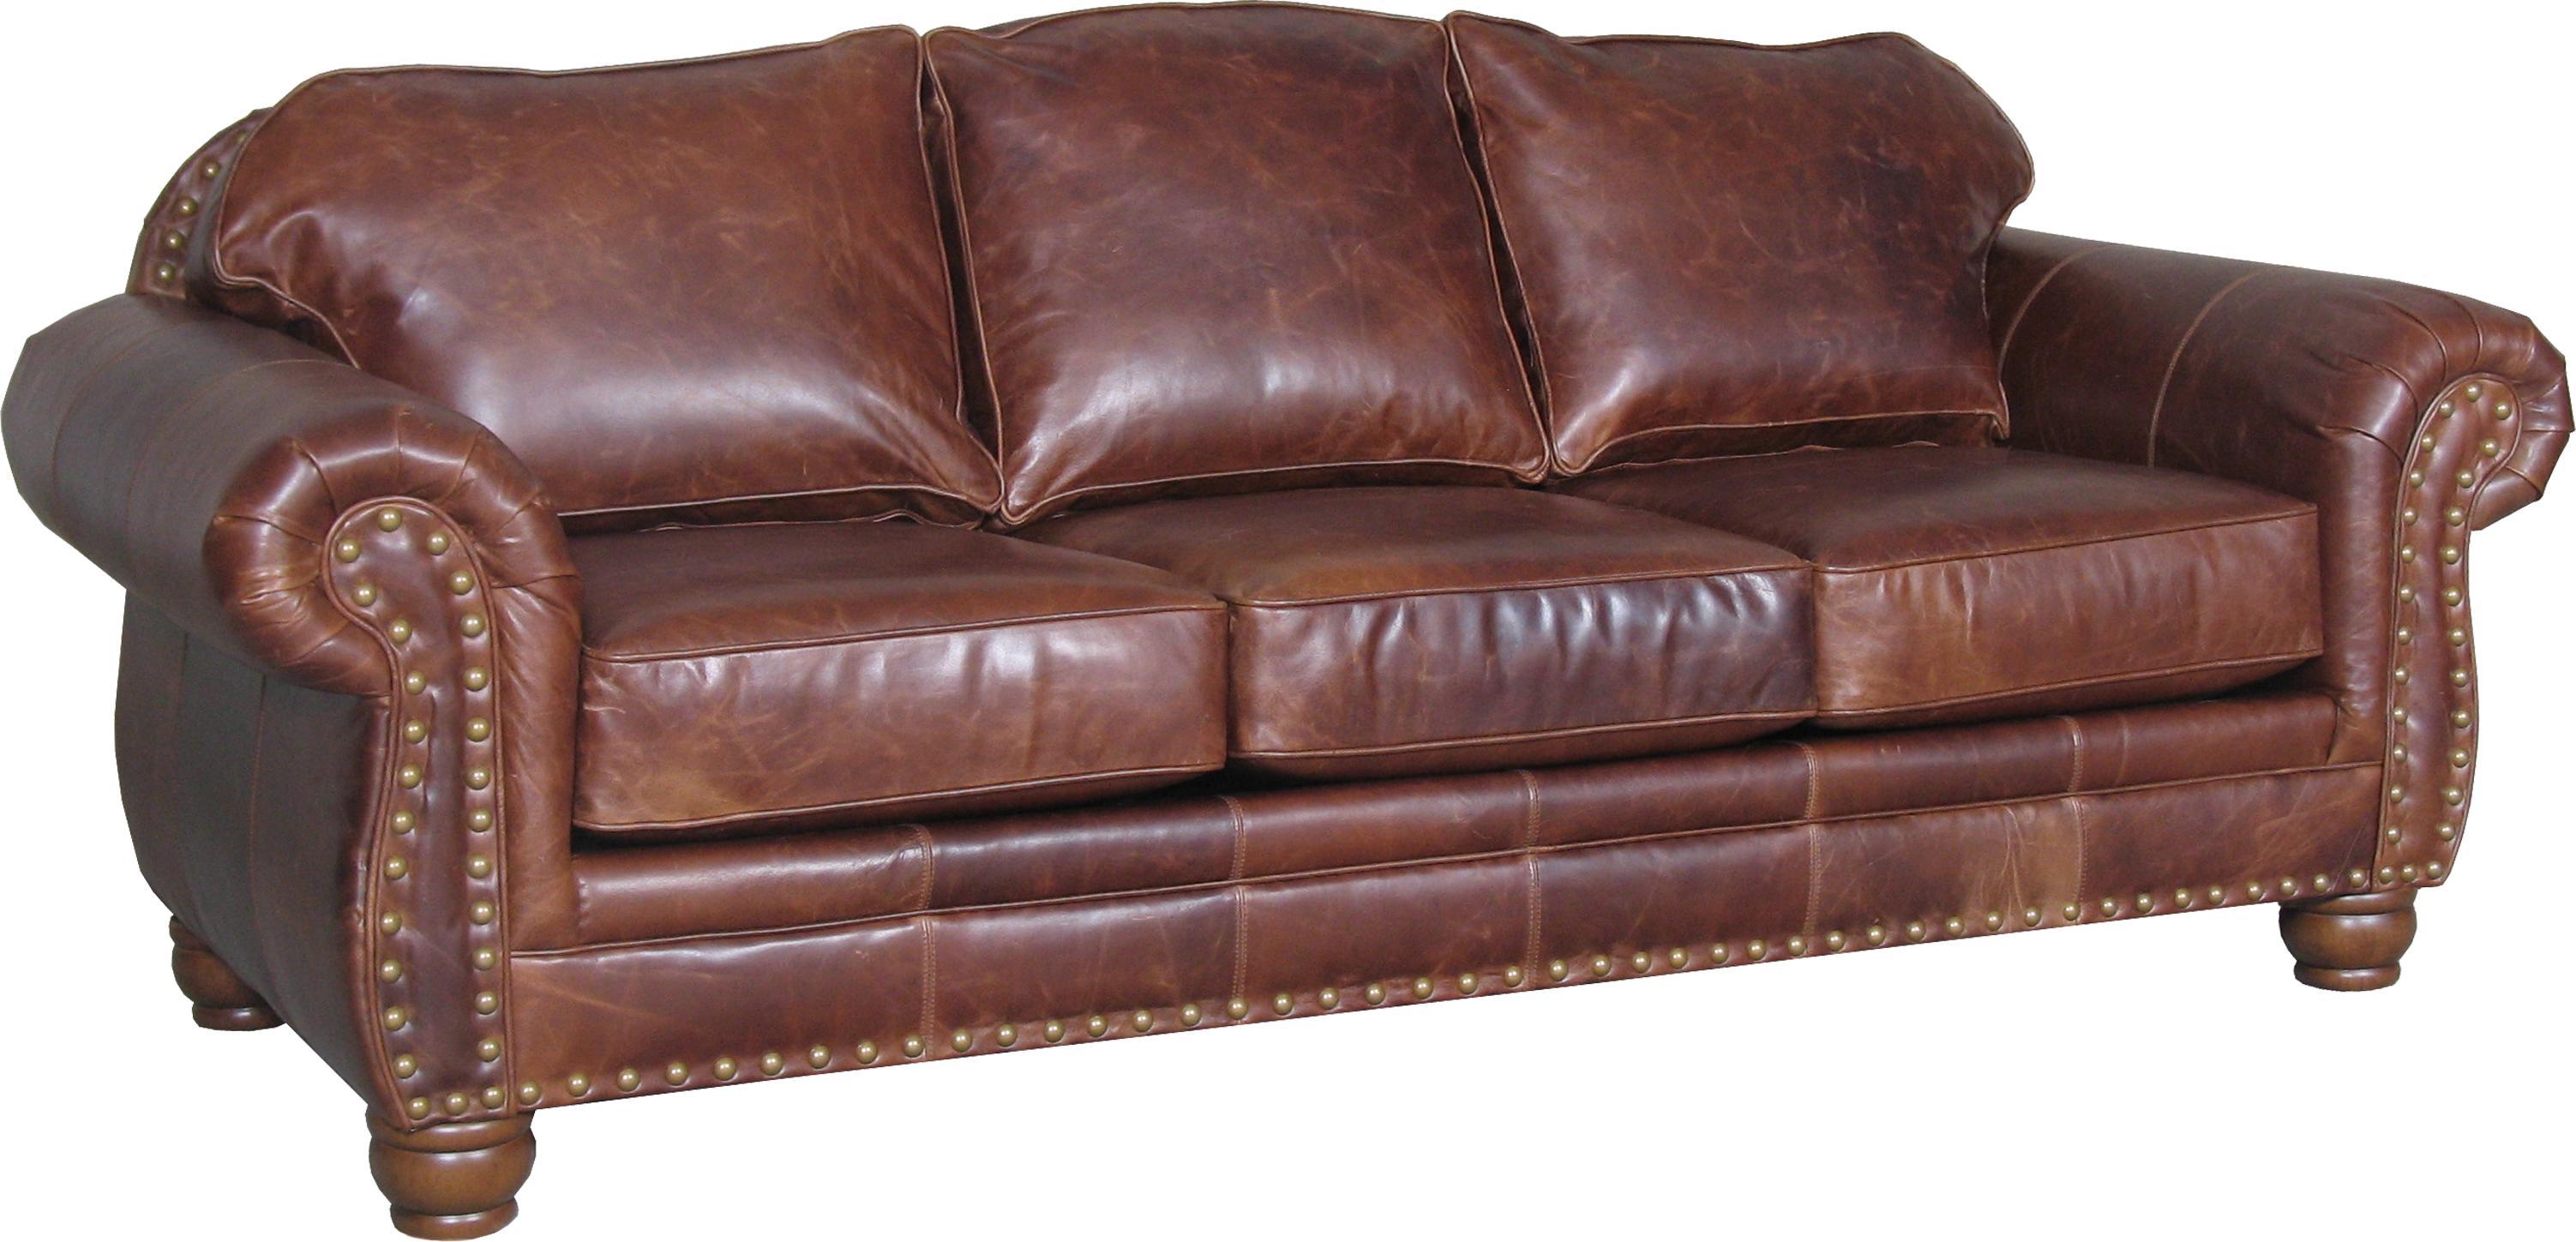 3180 Sofa by Mayo at Wilson's Furniture